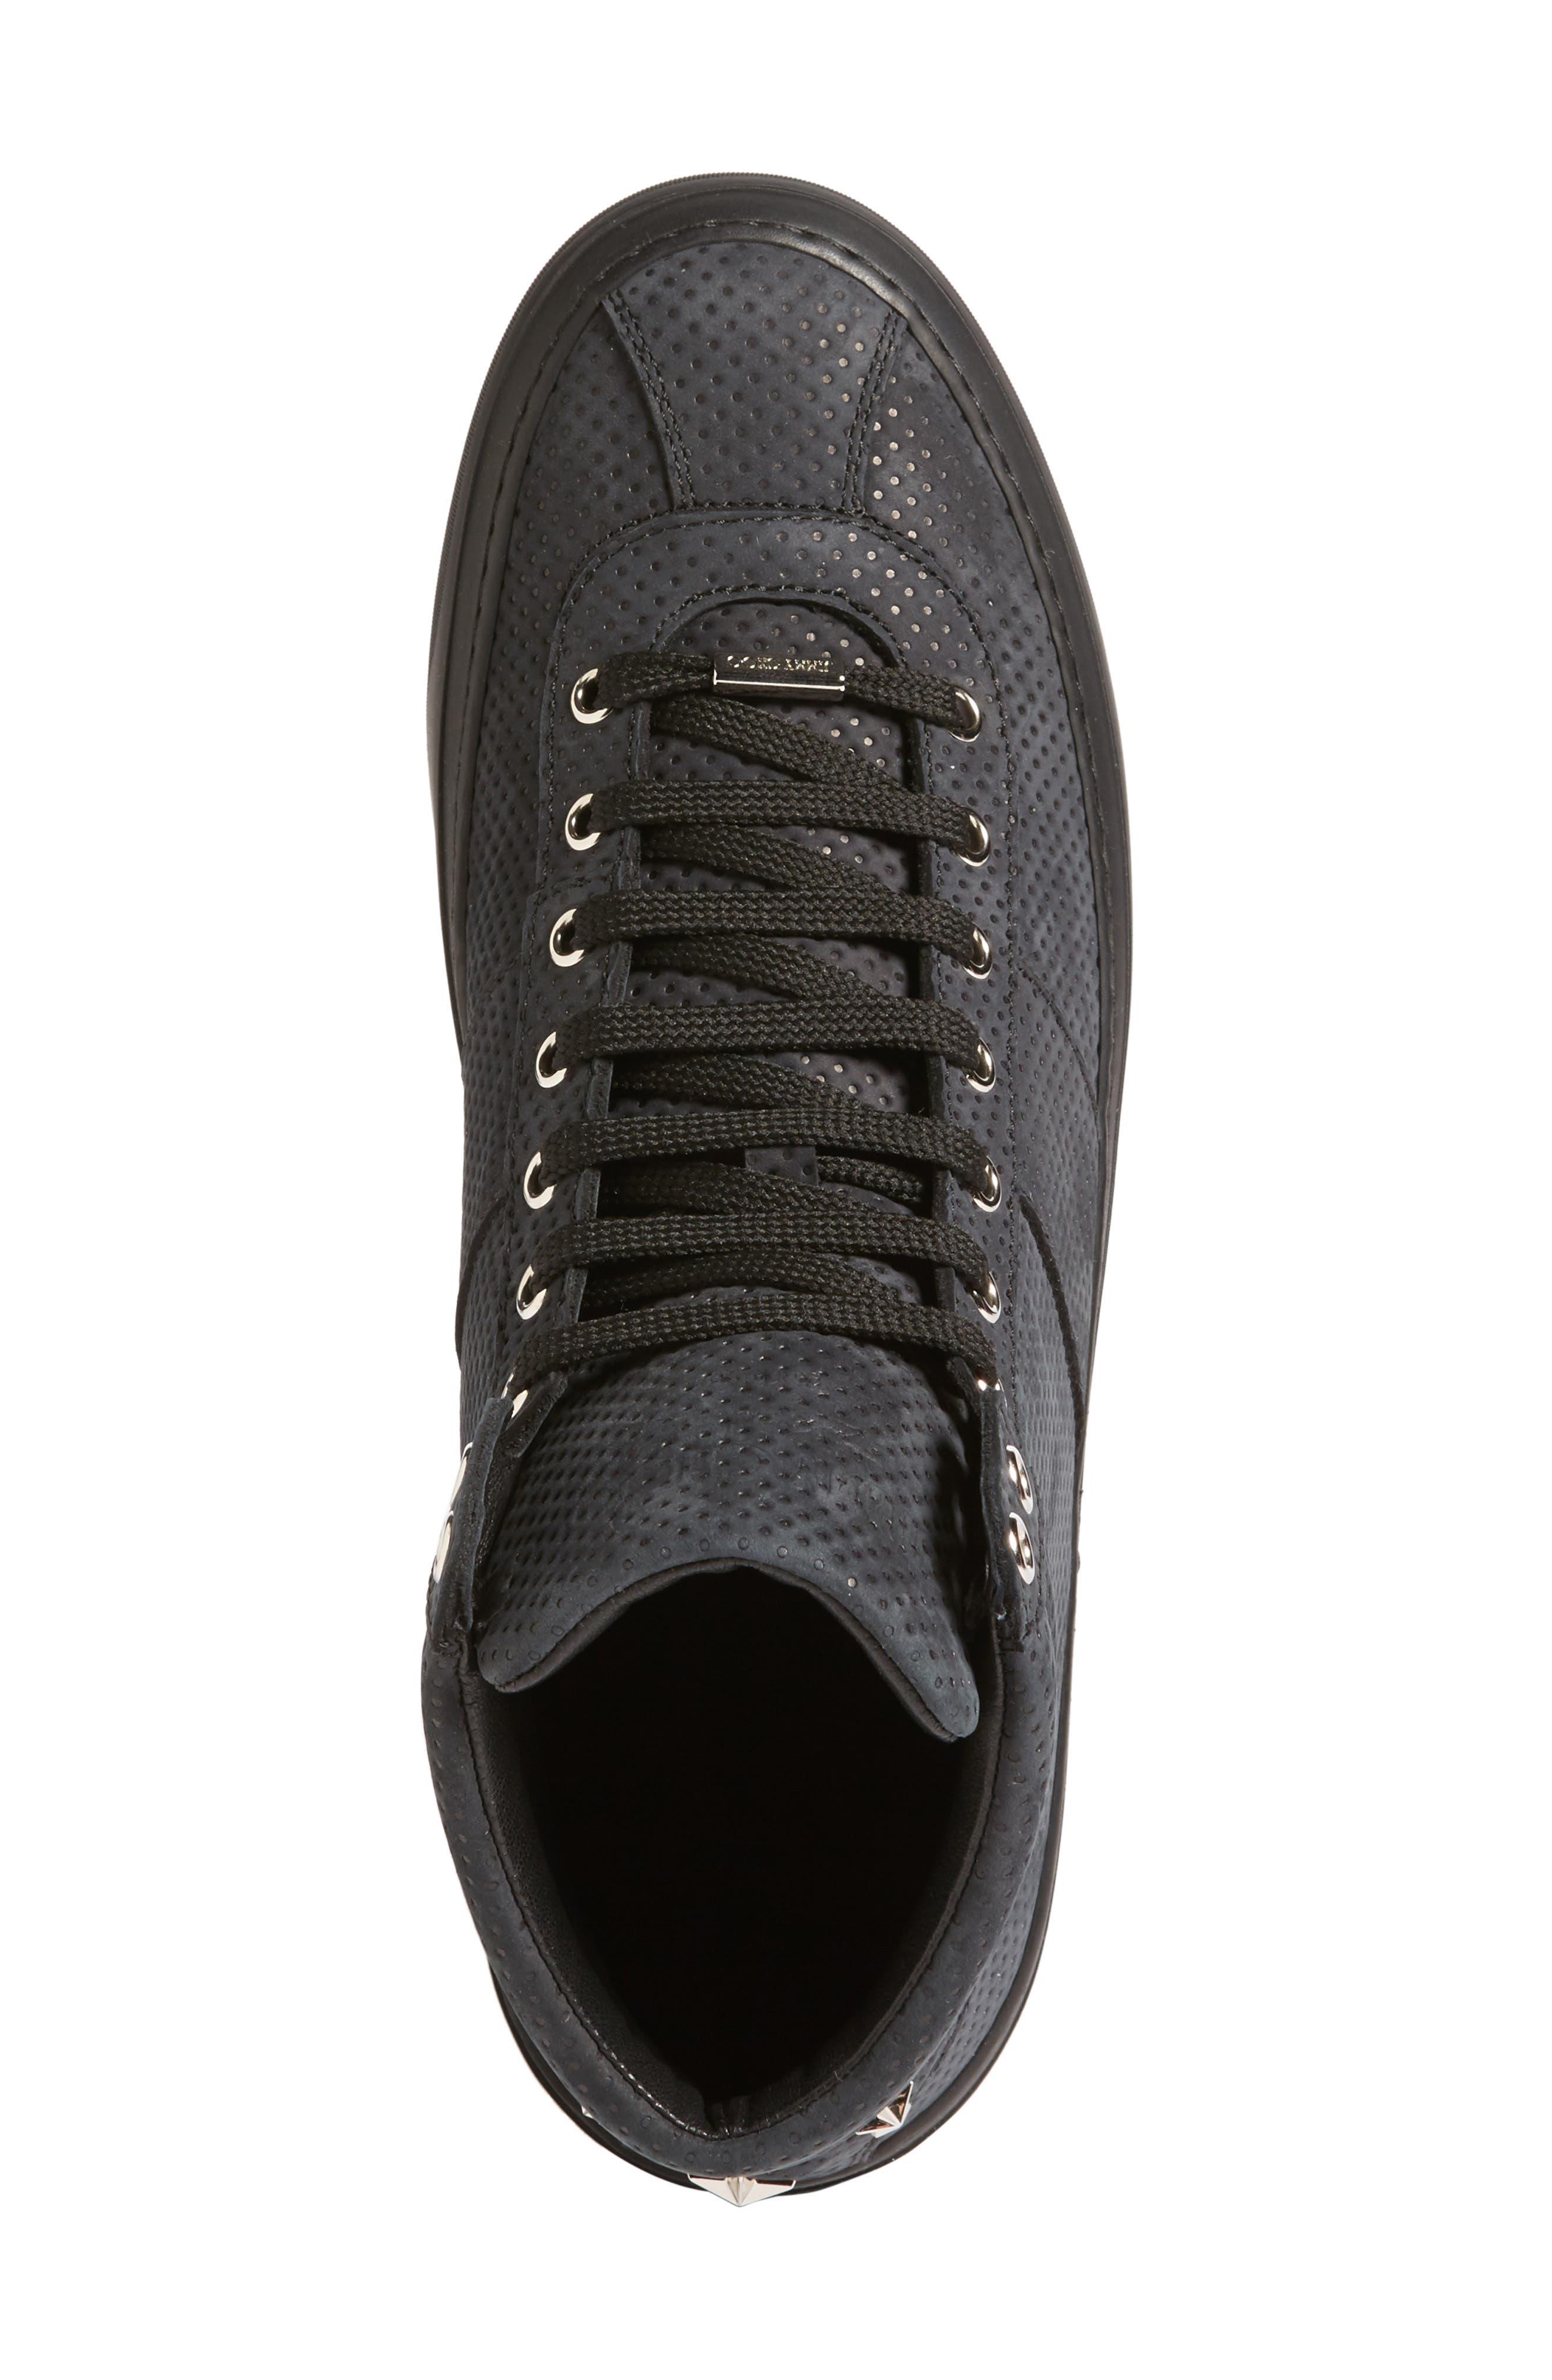 Belgravi Sneaker,                             Alternate thumbnail 5, color,                             Black/ Steel